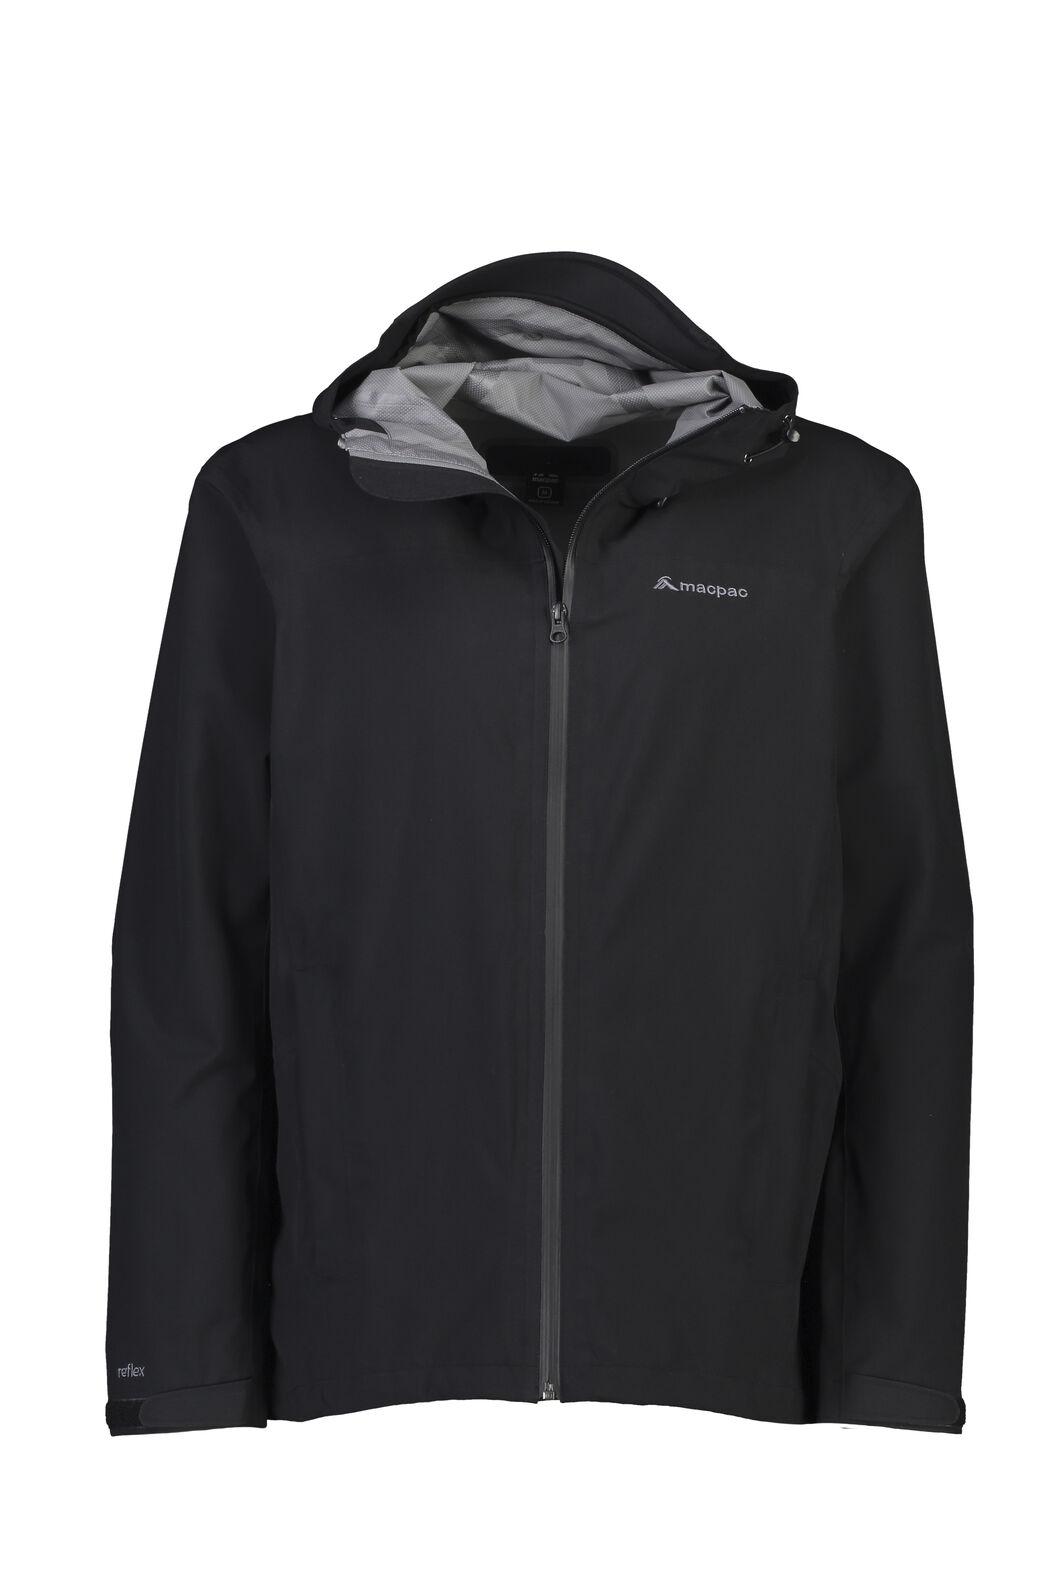 Macpac Dispatch Rain Jacket - Men's, Black, hi-res